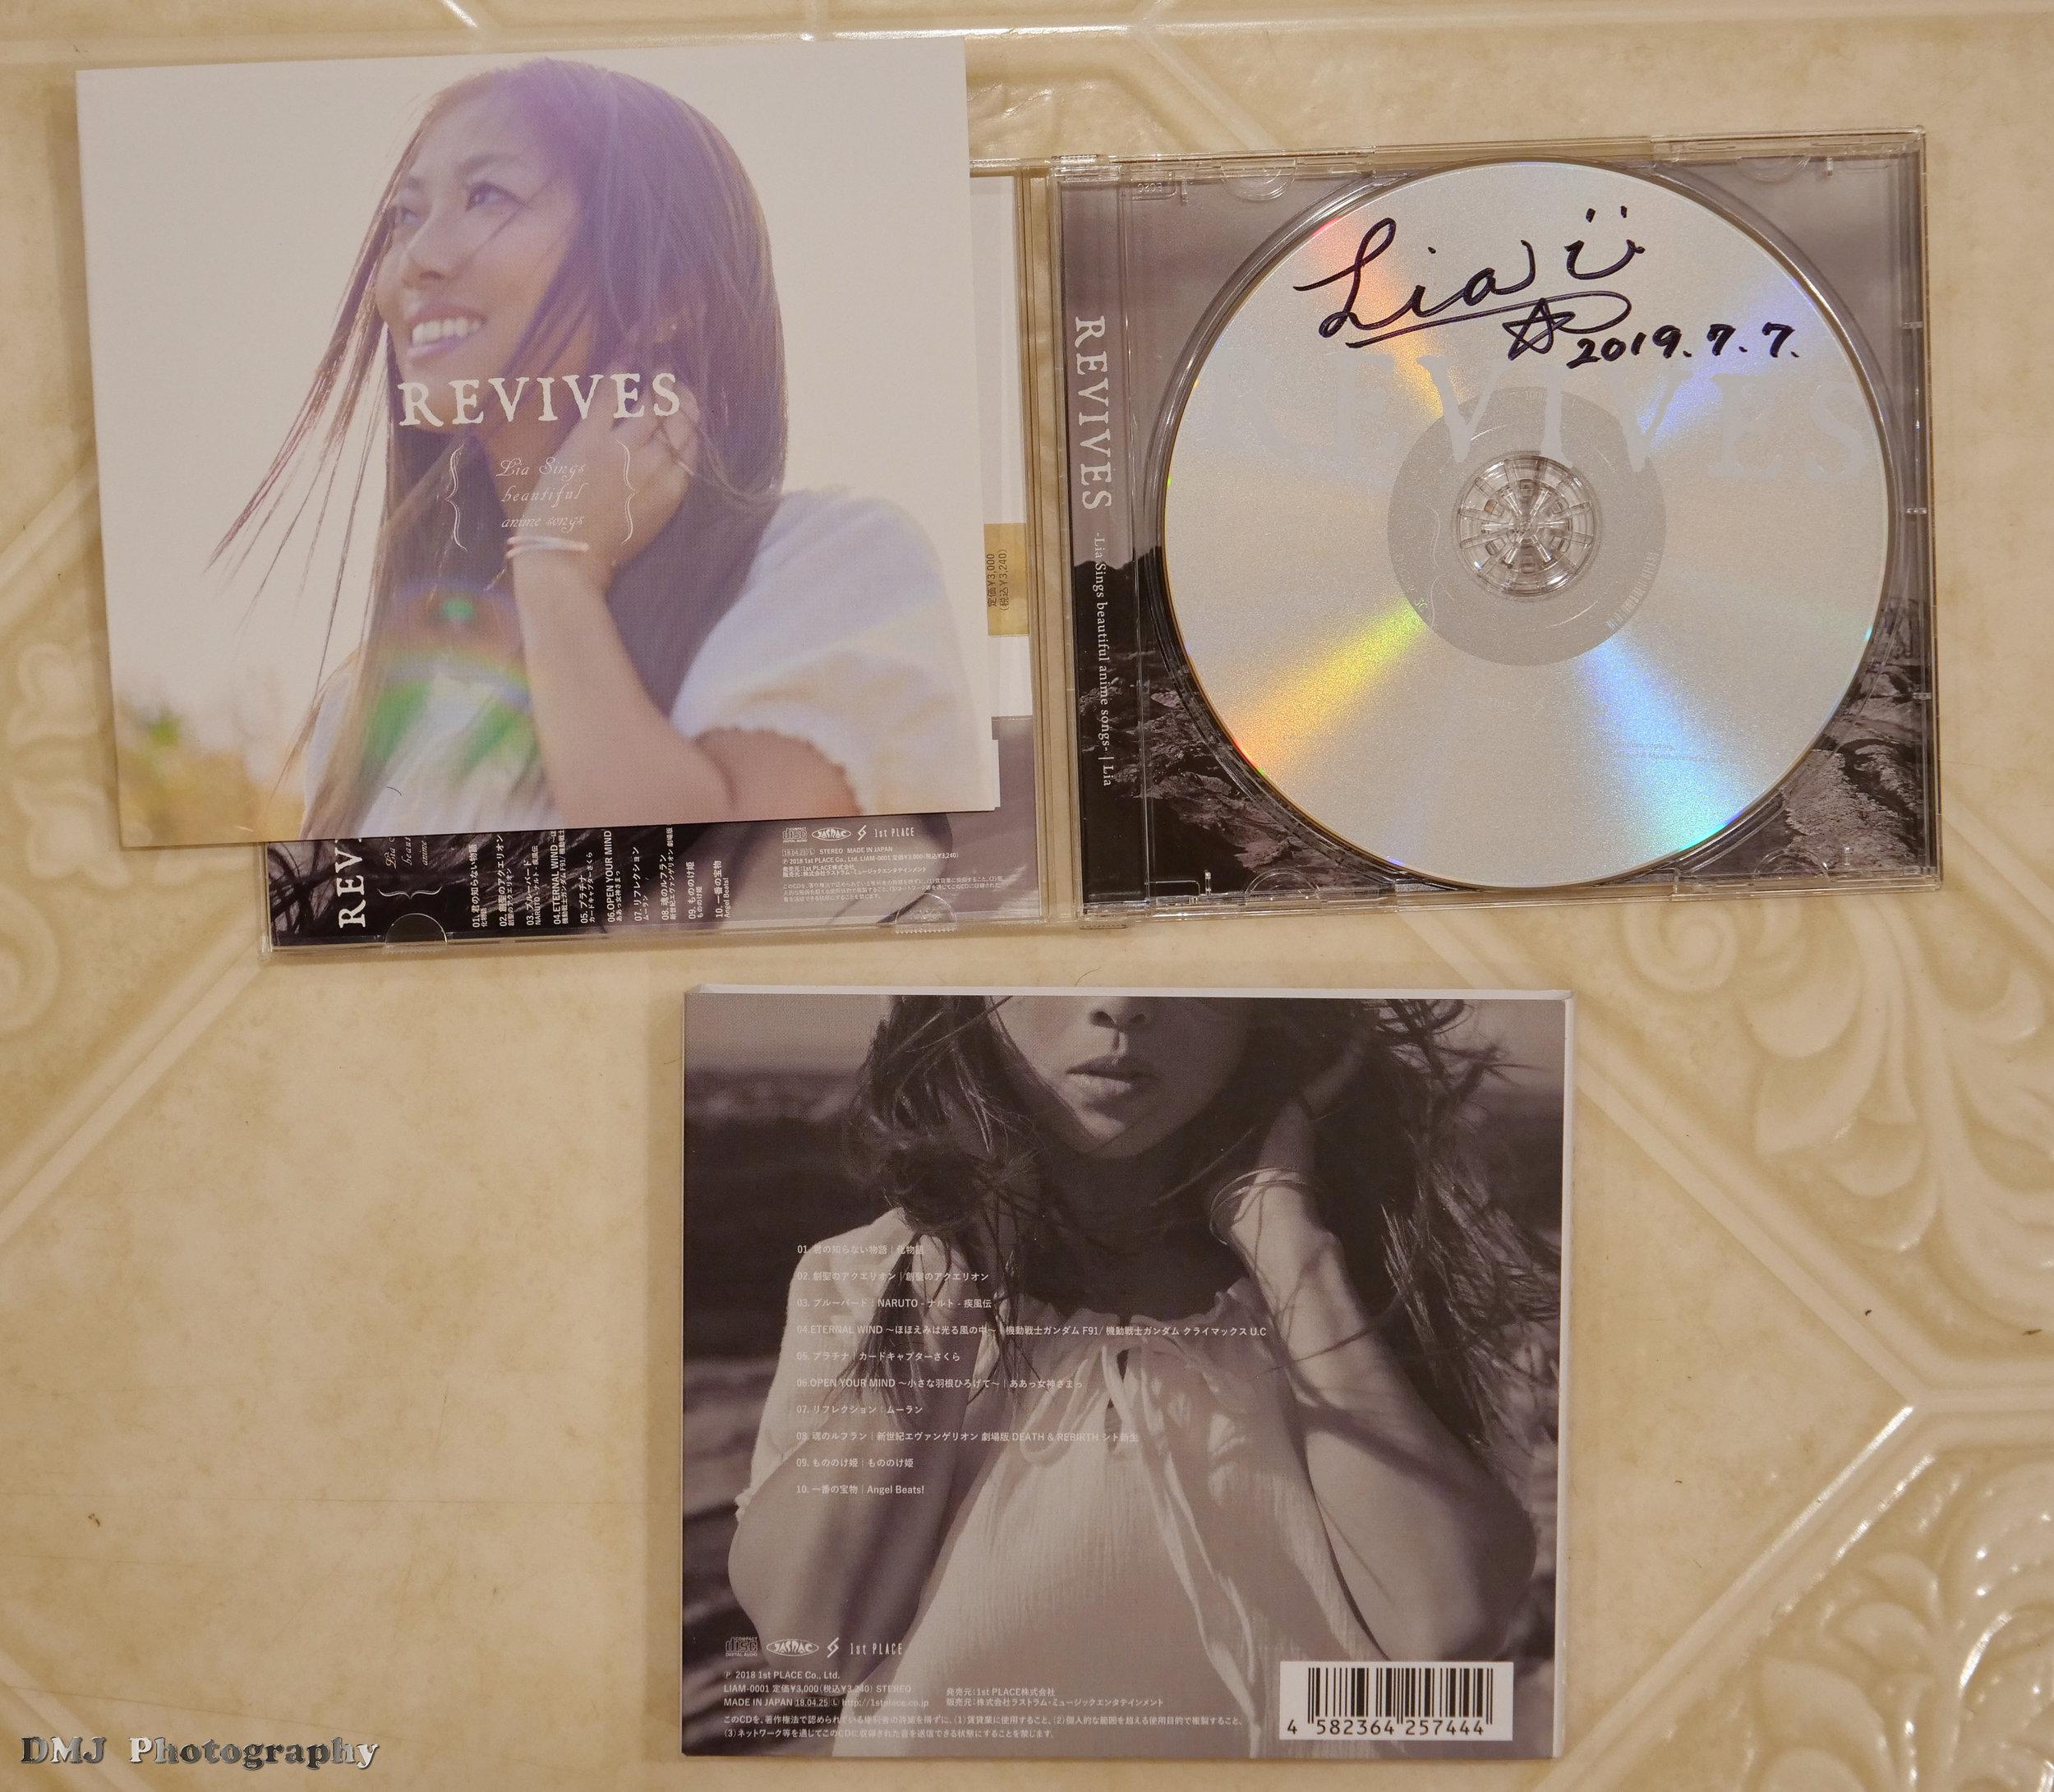 Autographed CD